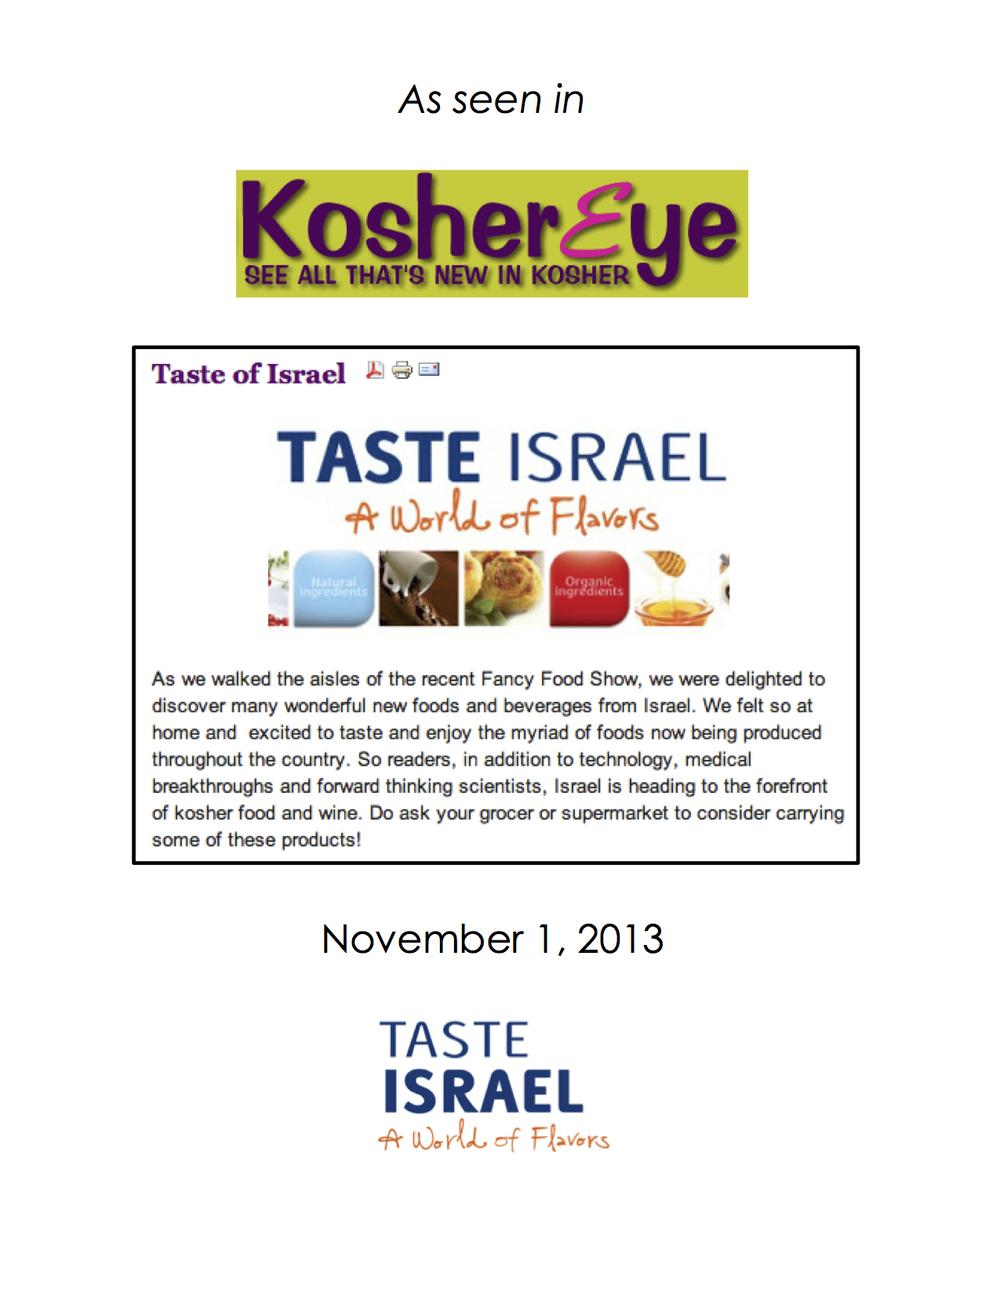 israel-asseenin-koshereye copy.jpg